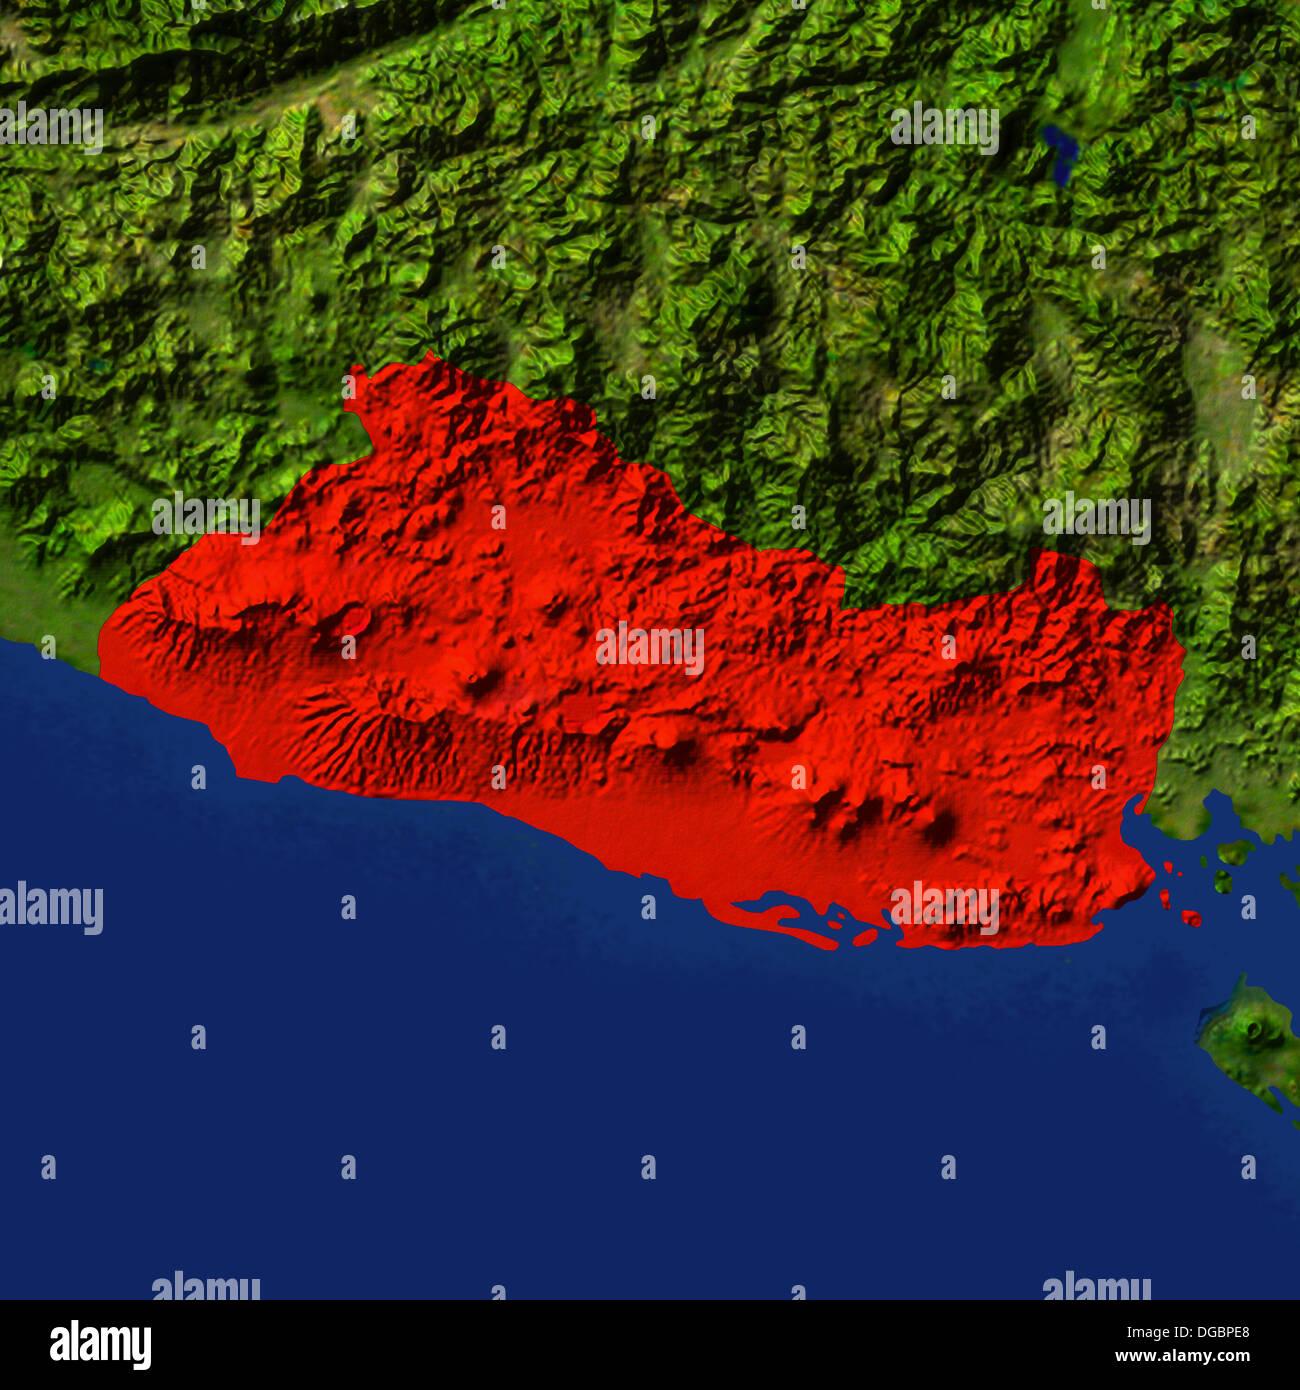 Highlighted Satellite Image Of El Salvador Stock Photo Royalty - Satellite image photo of el salvador